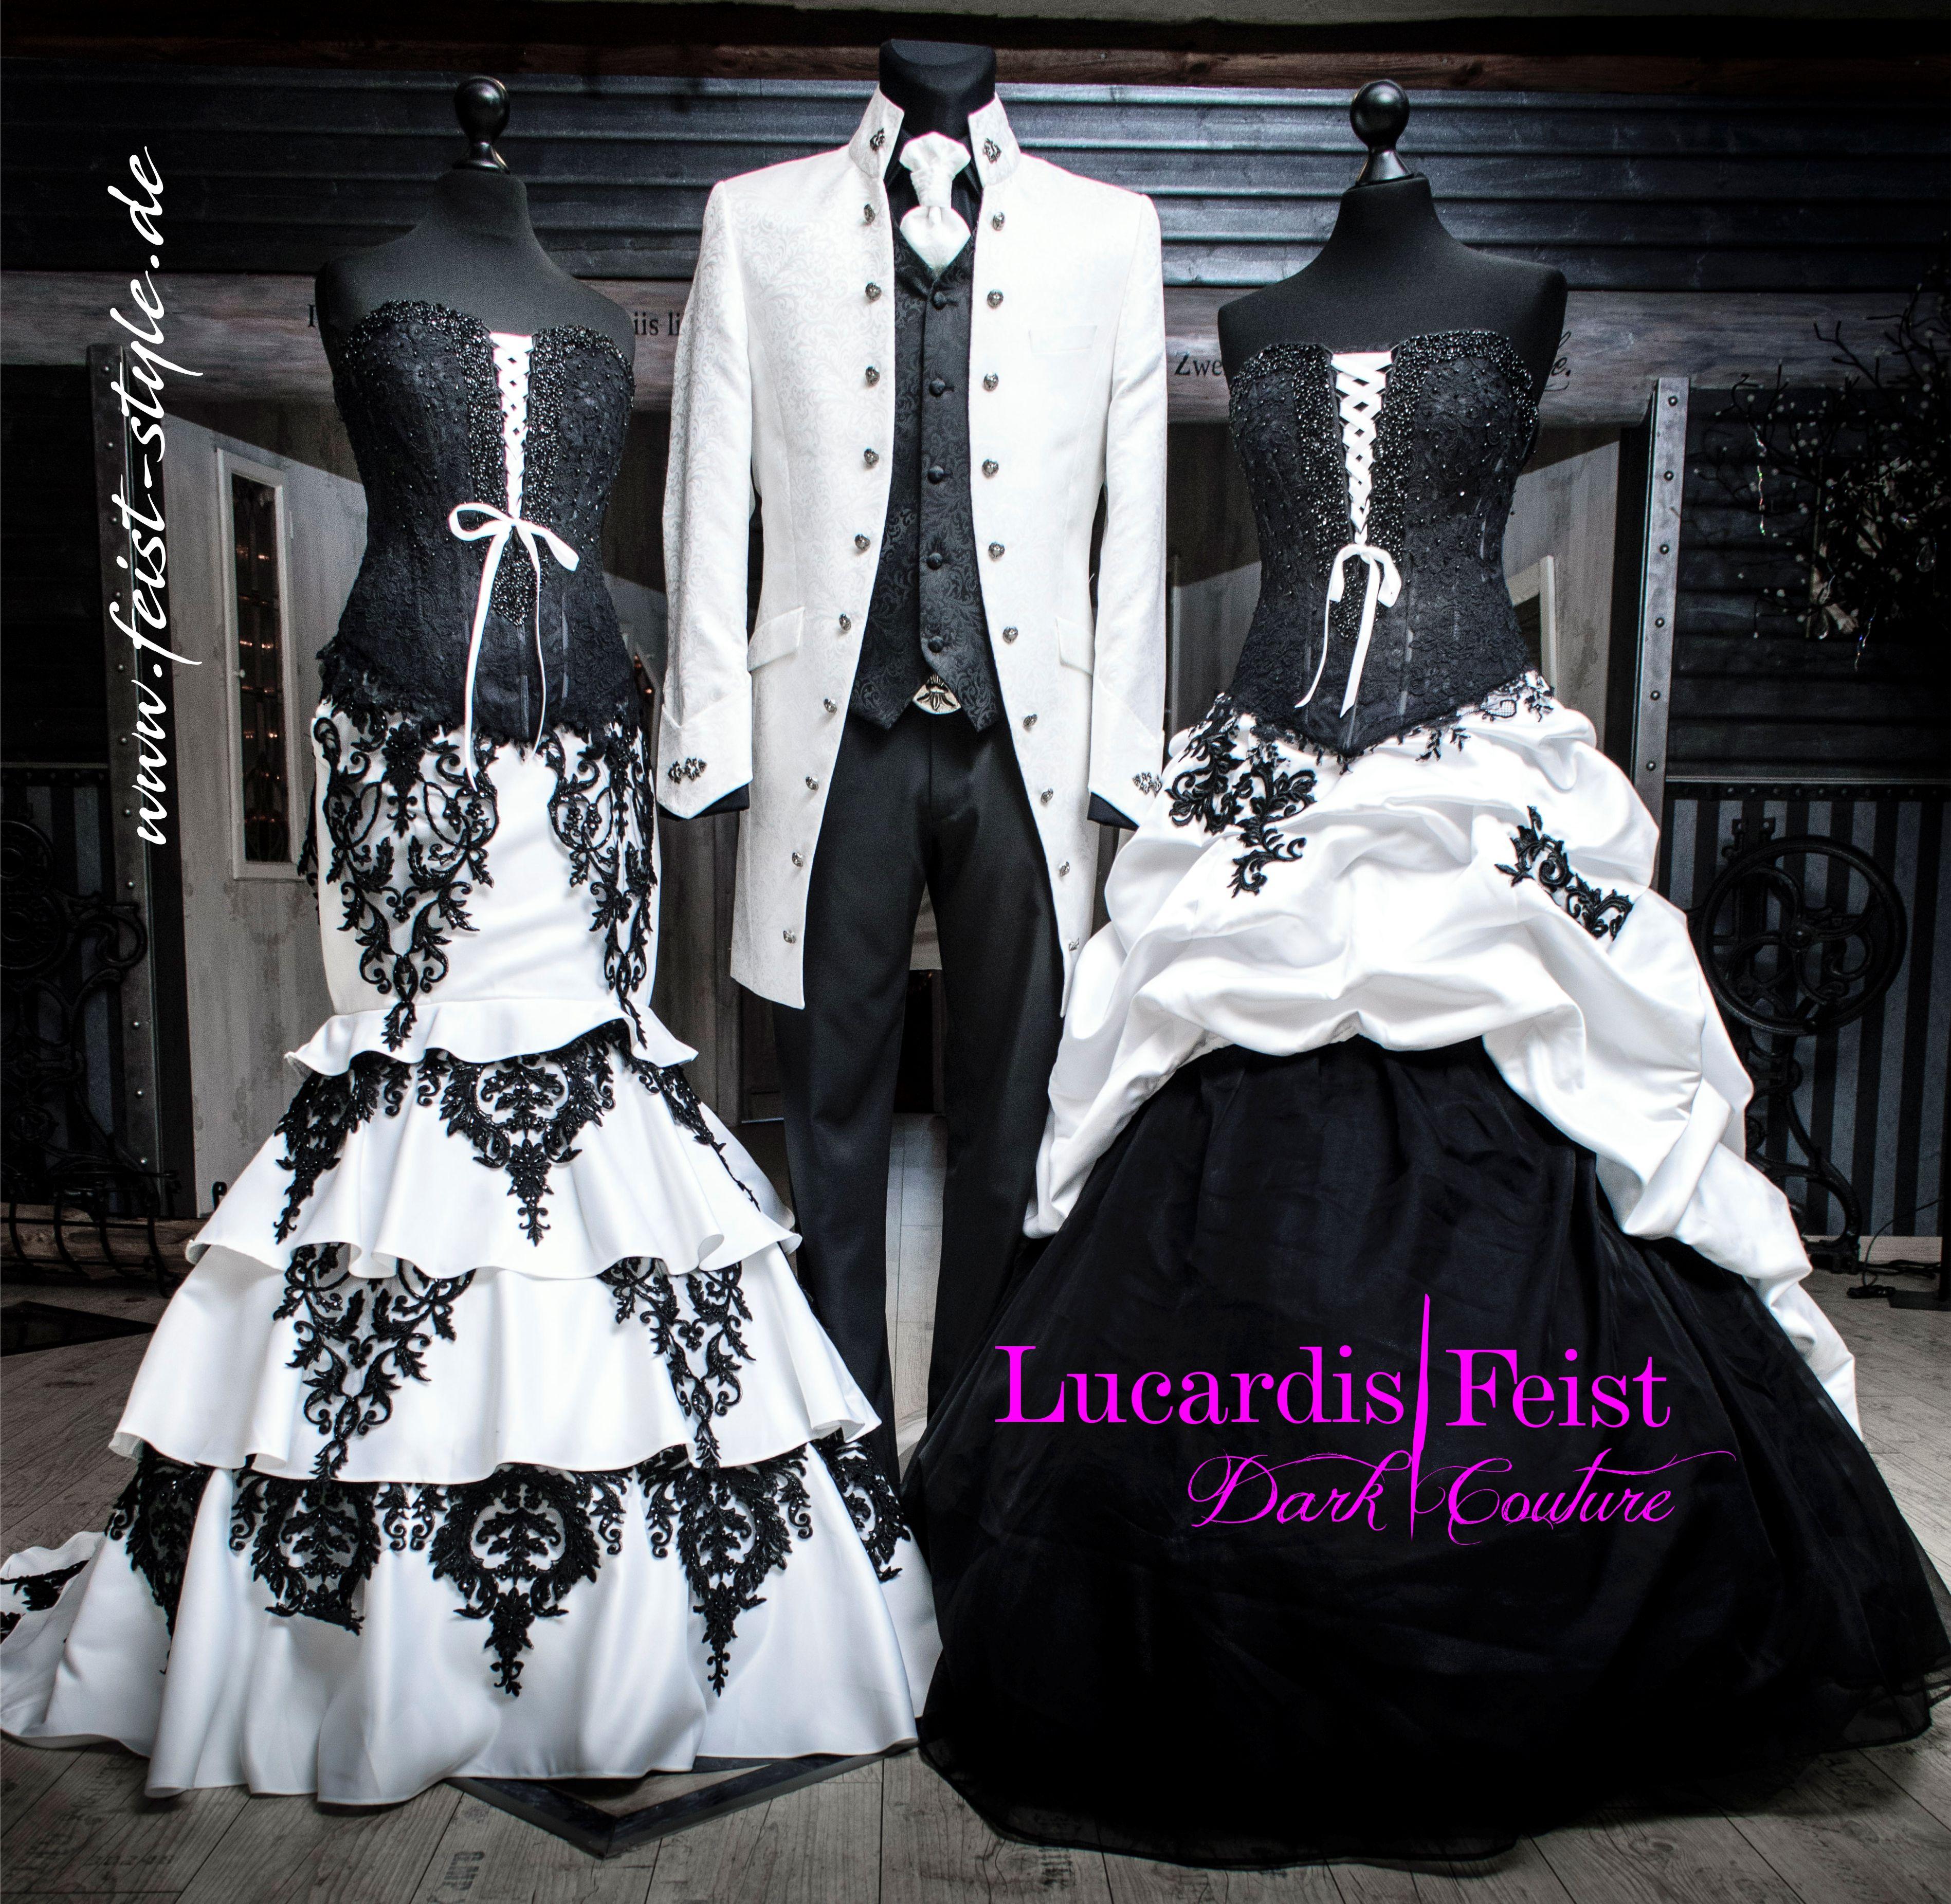 Extraordinary Wedding Lucardis Feist Dark Couture Wedding Suits Groom Extravagant Wedding Dresses Black Wedding Dresses [ 3704 x 3795 Pixel ]